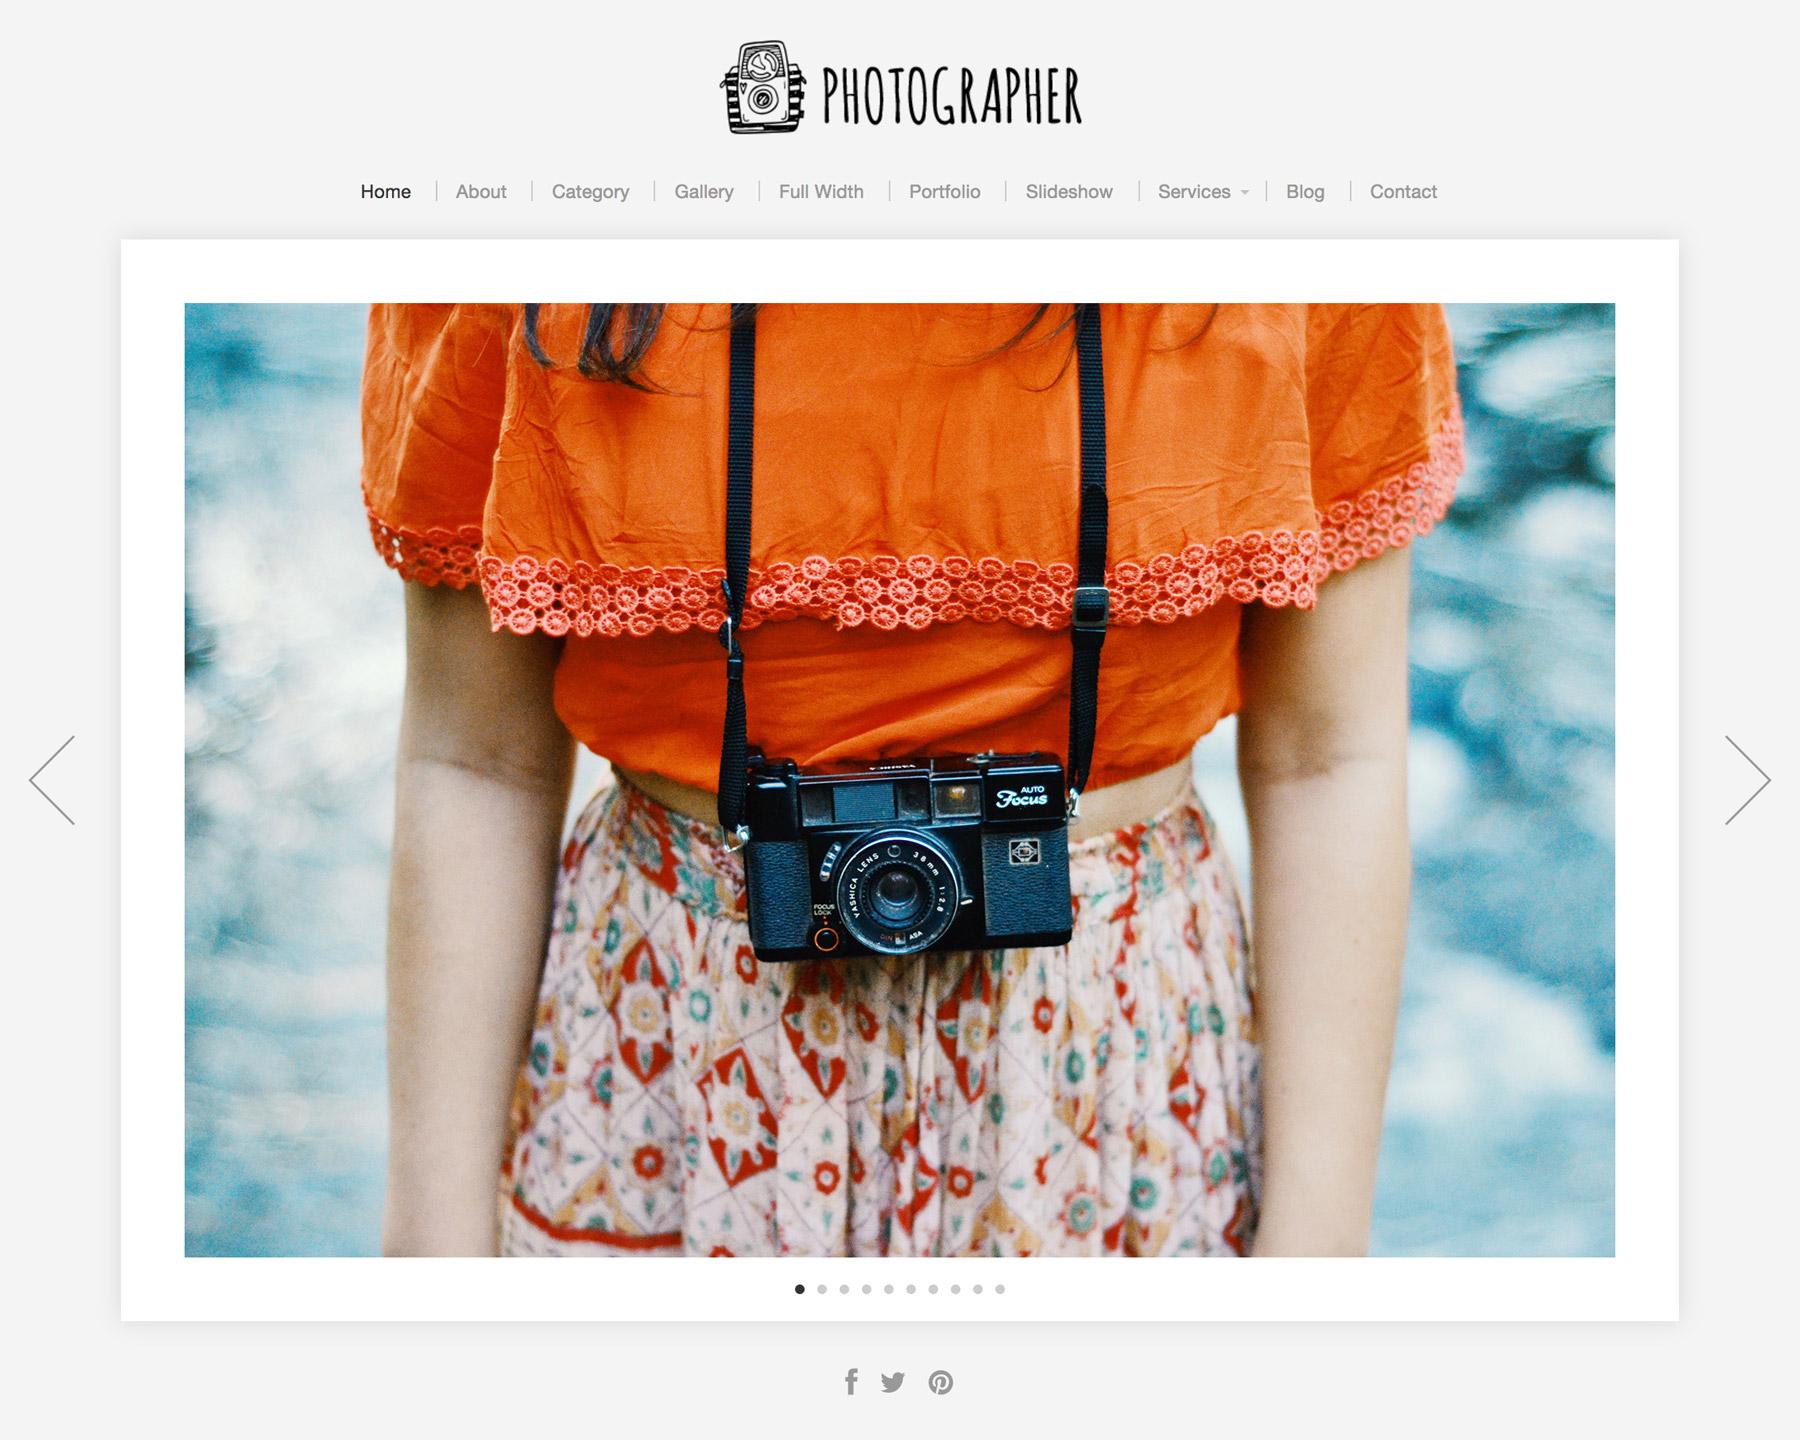 Screenshot of the Photographer theme